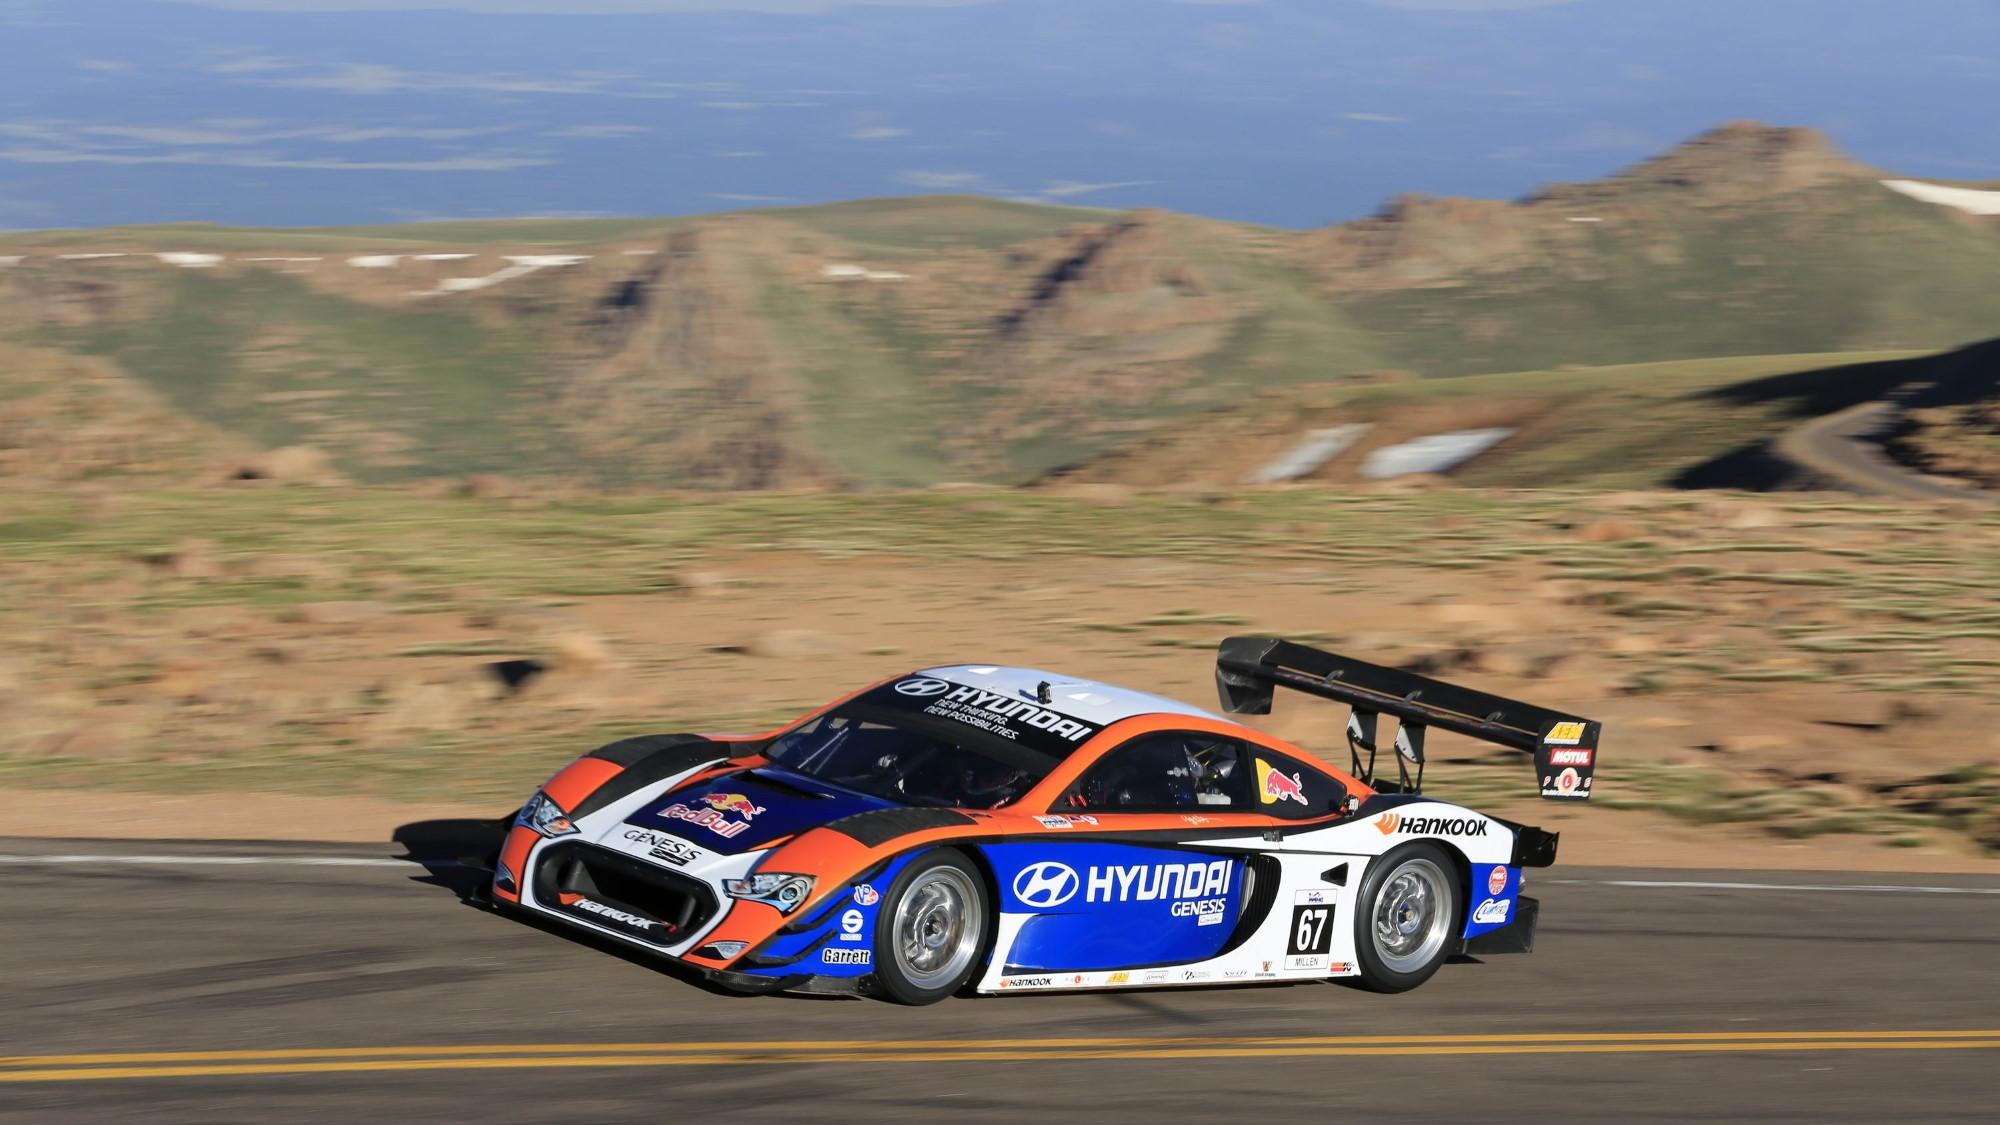 Rhys Millen Racing / Hyundai Motorsports PM580-T Pikes Peak race car